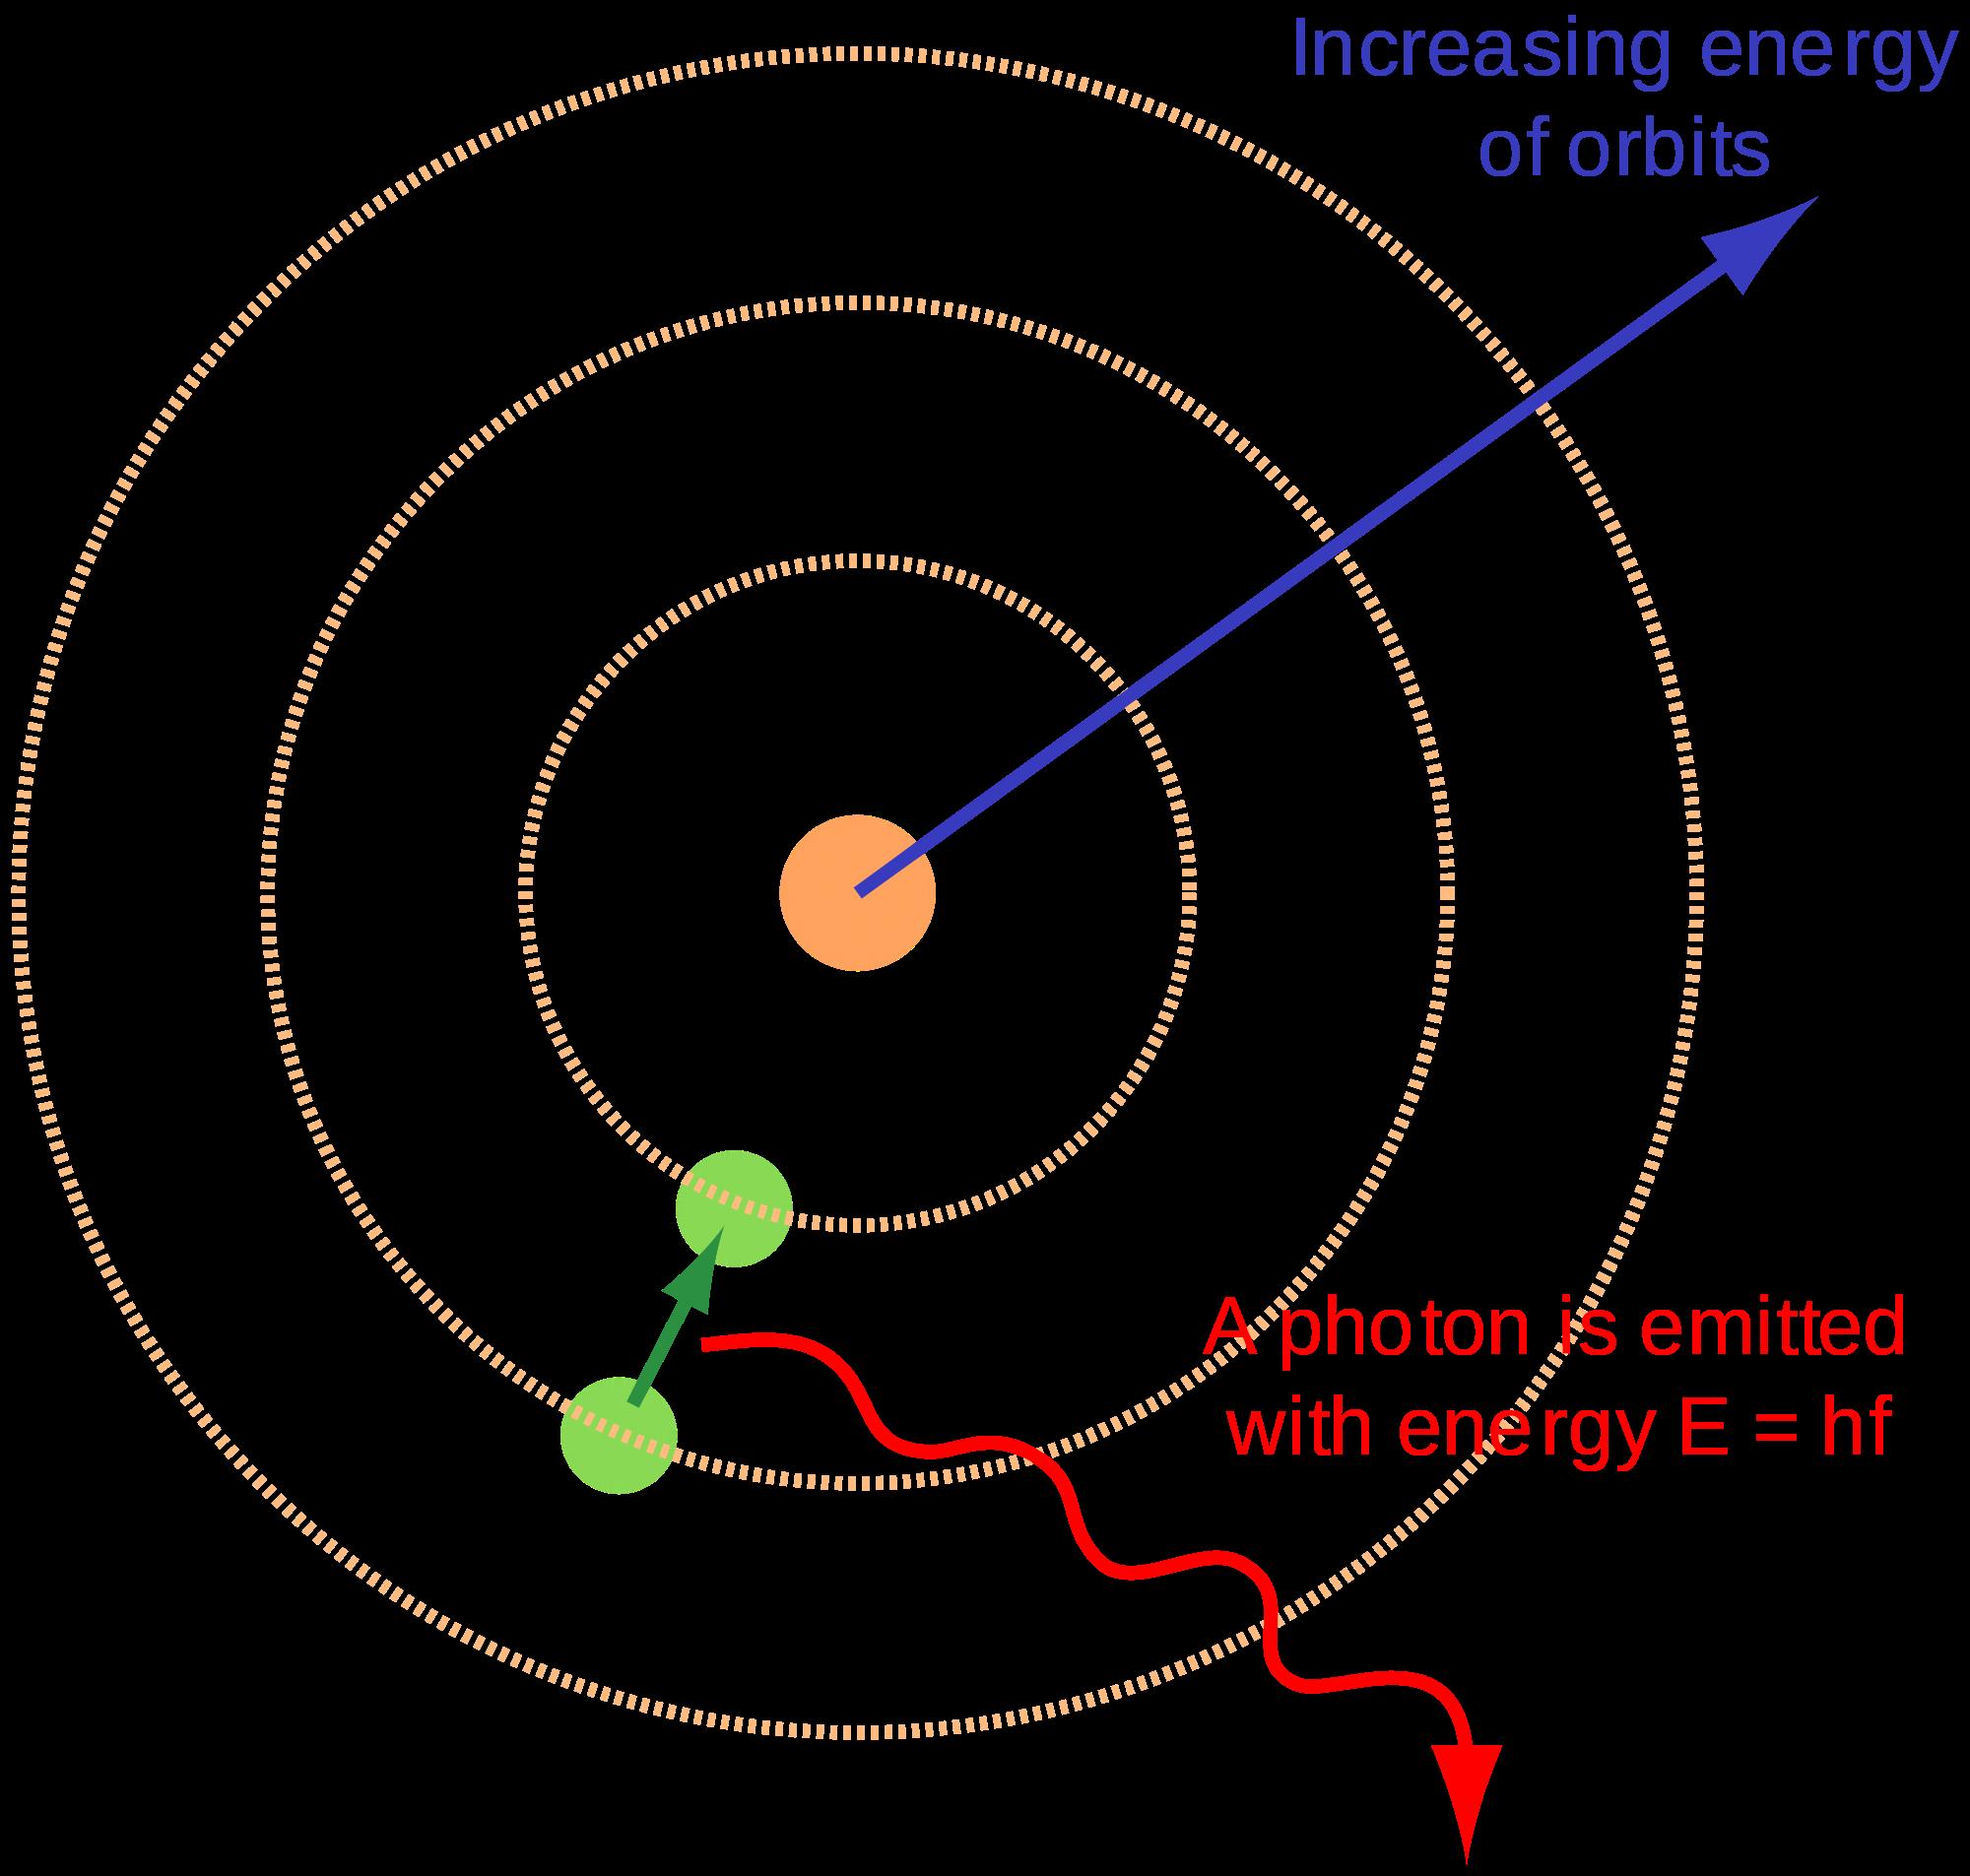 worksheet Models Of The Atom Worksheet joindesignseattle – Models of the Atom Worksheet